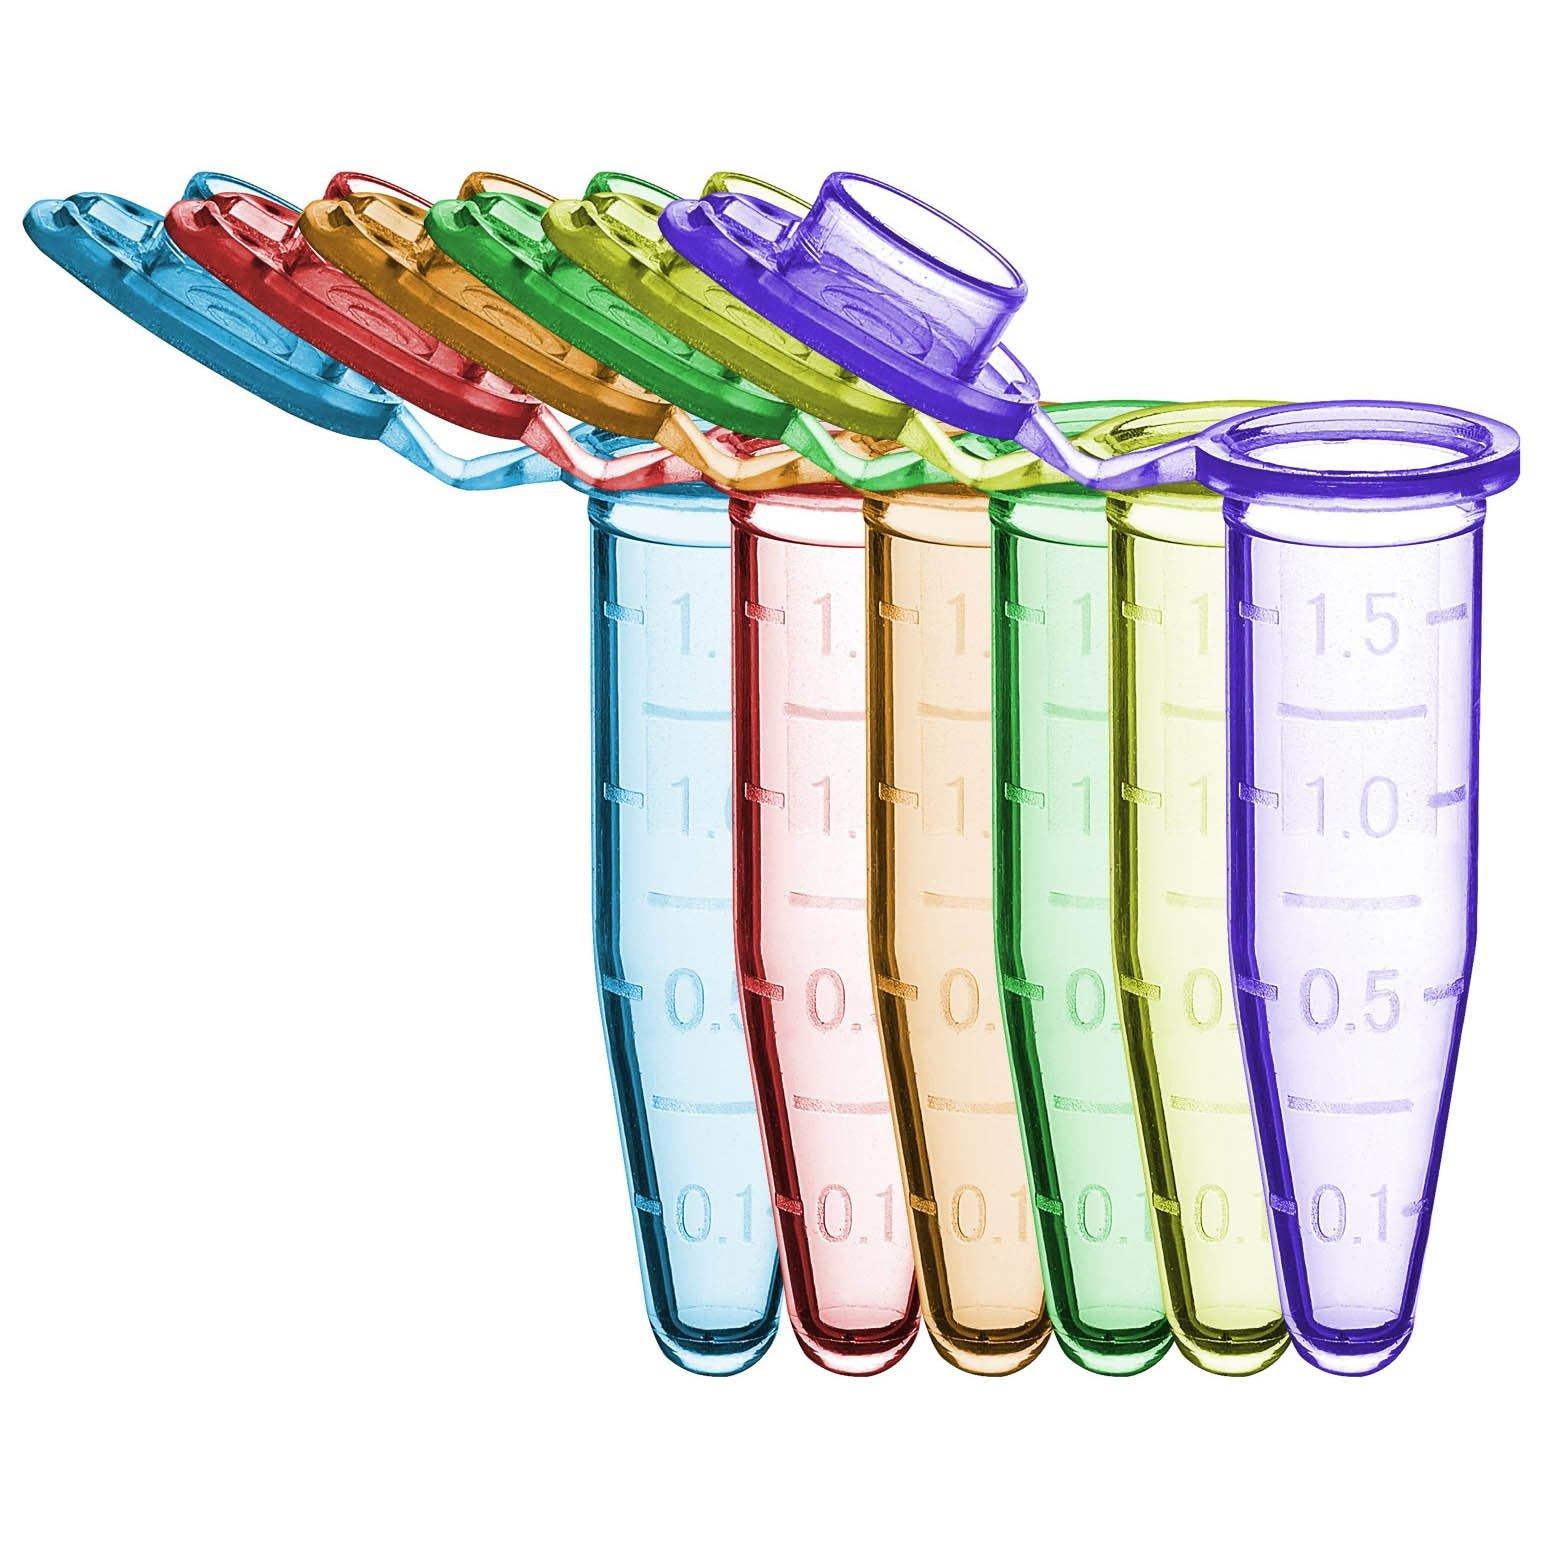 SureSeal S 1.5mL Sterile Microcentrifuge Tube - Assorted Colors (500 Tubes & 10 Stop-Pops/Bag, 1 Bag/Pack)